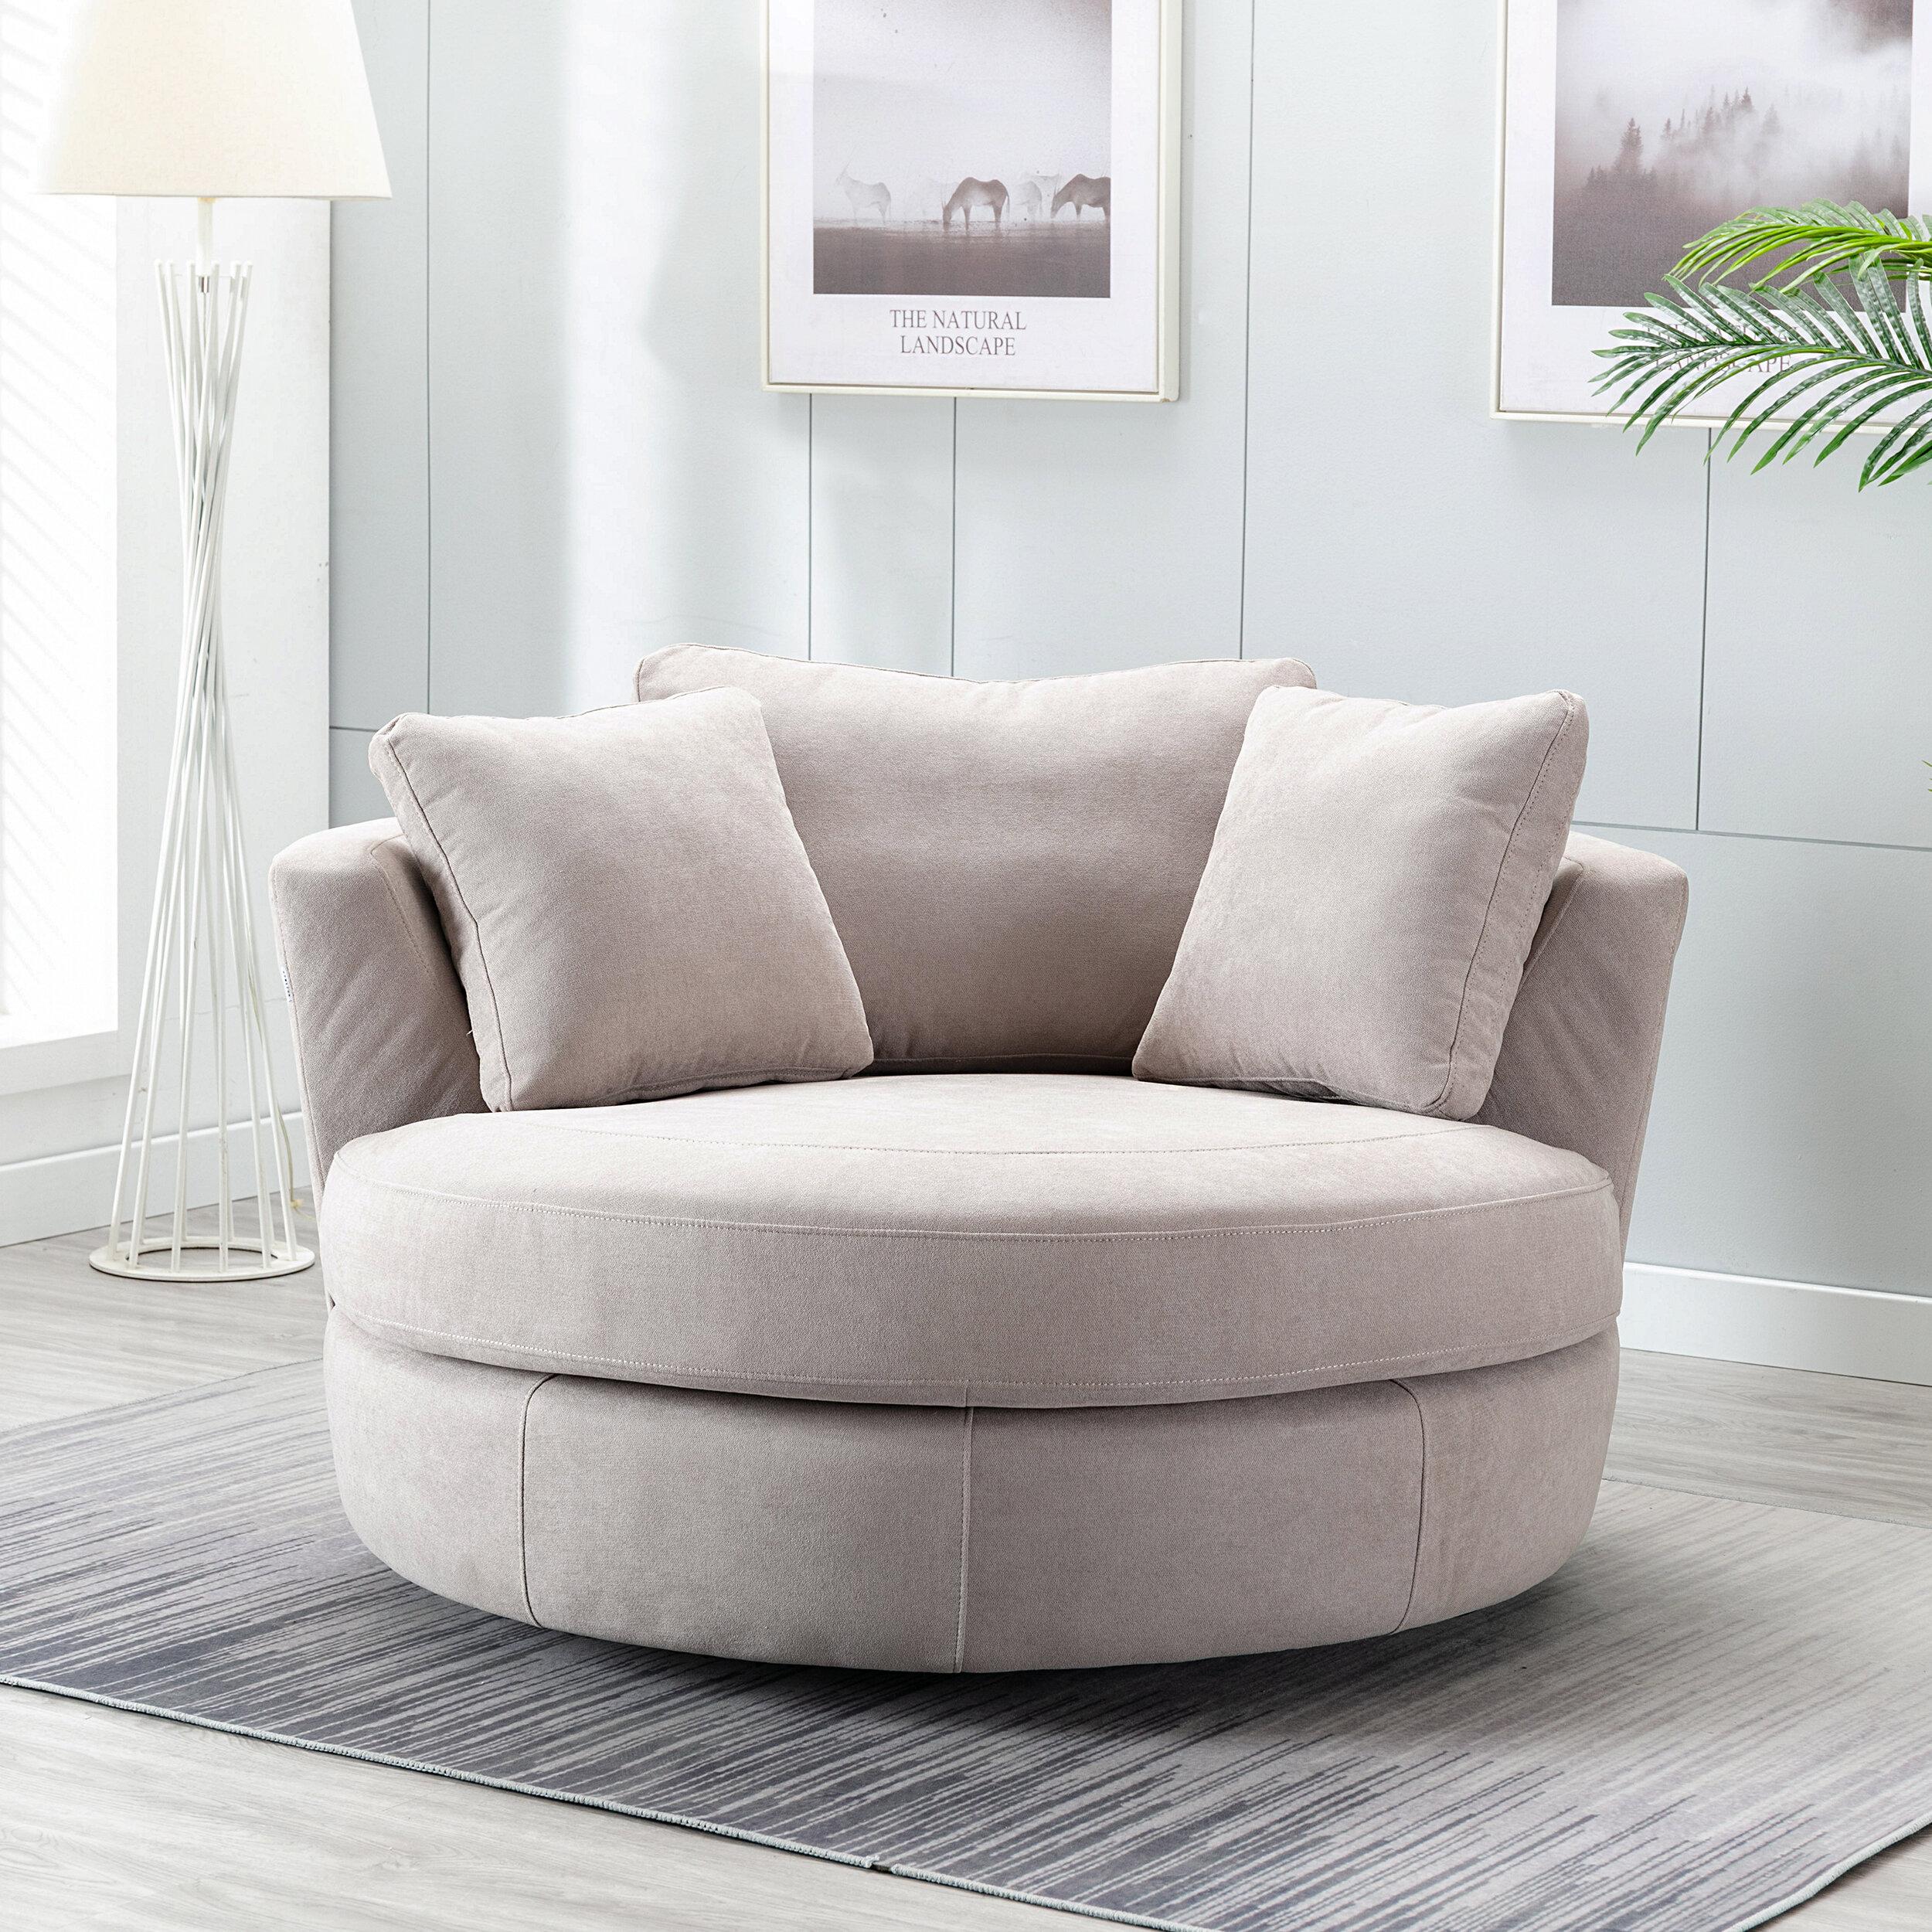 Minorca Elegant Round Swivel Barrel Chair